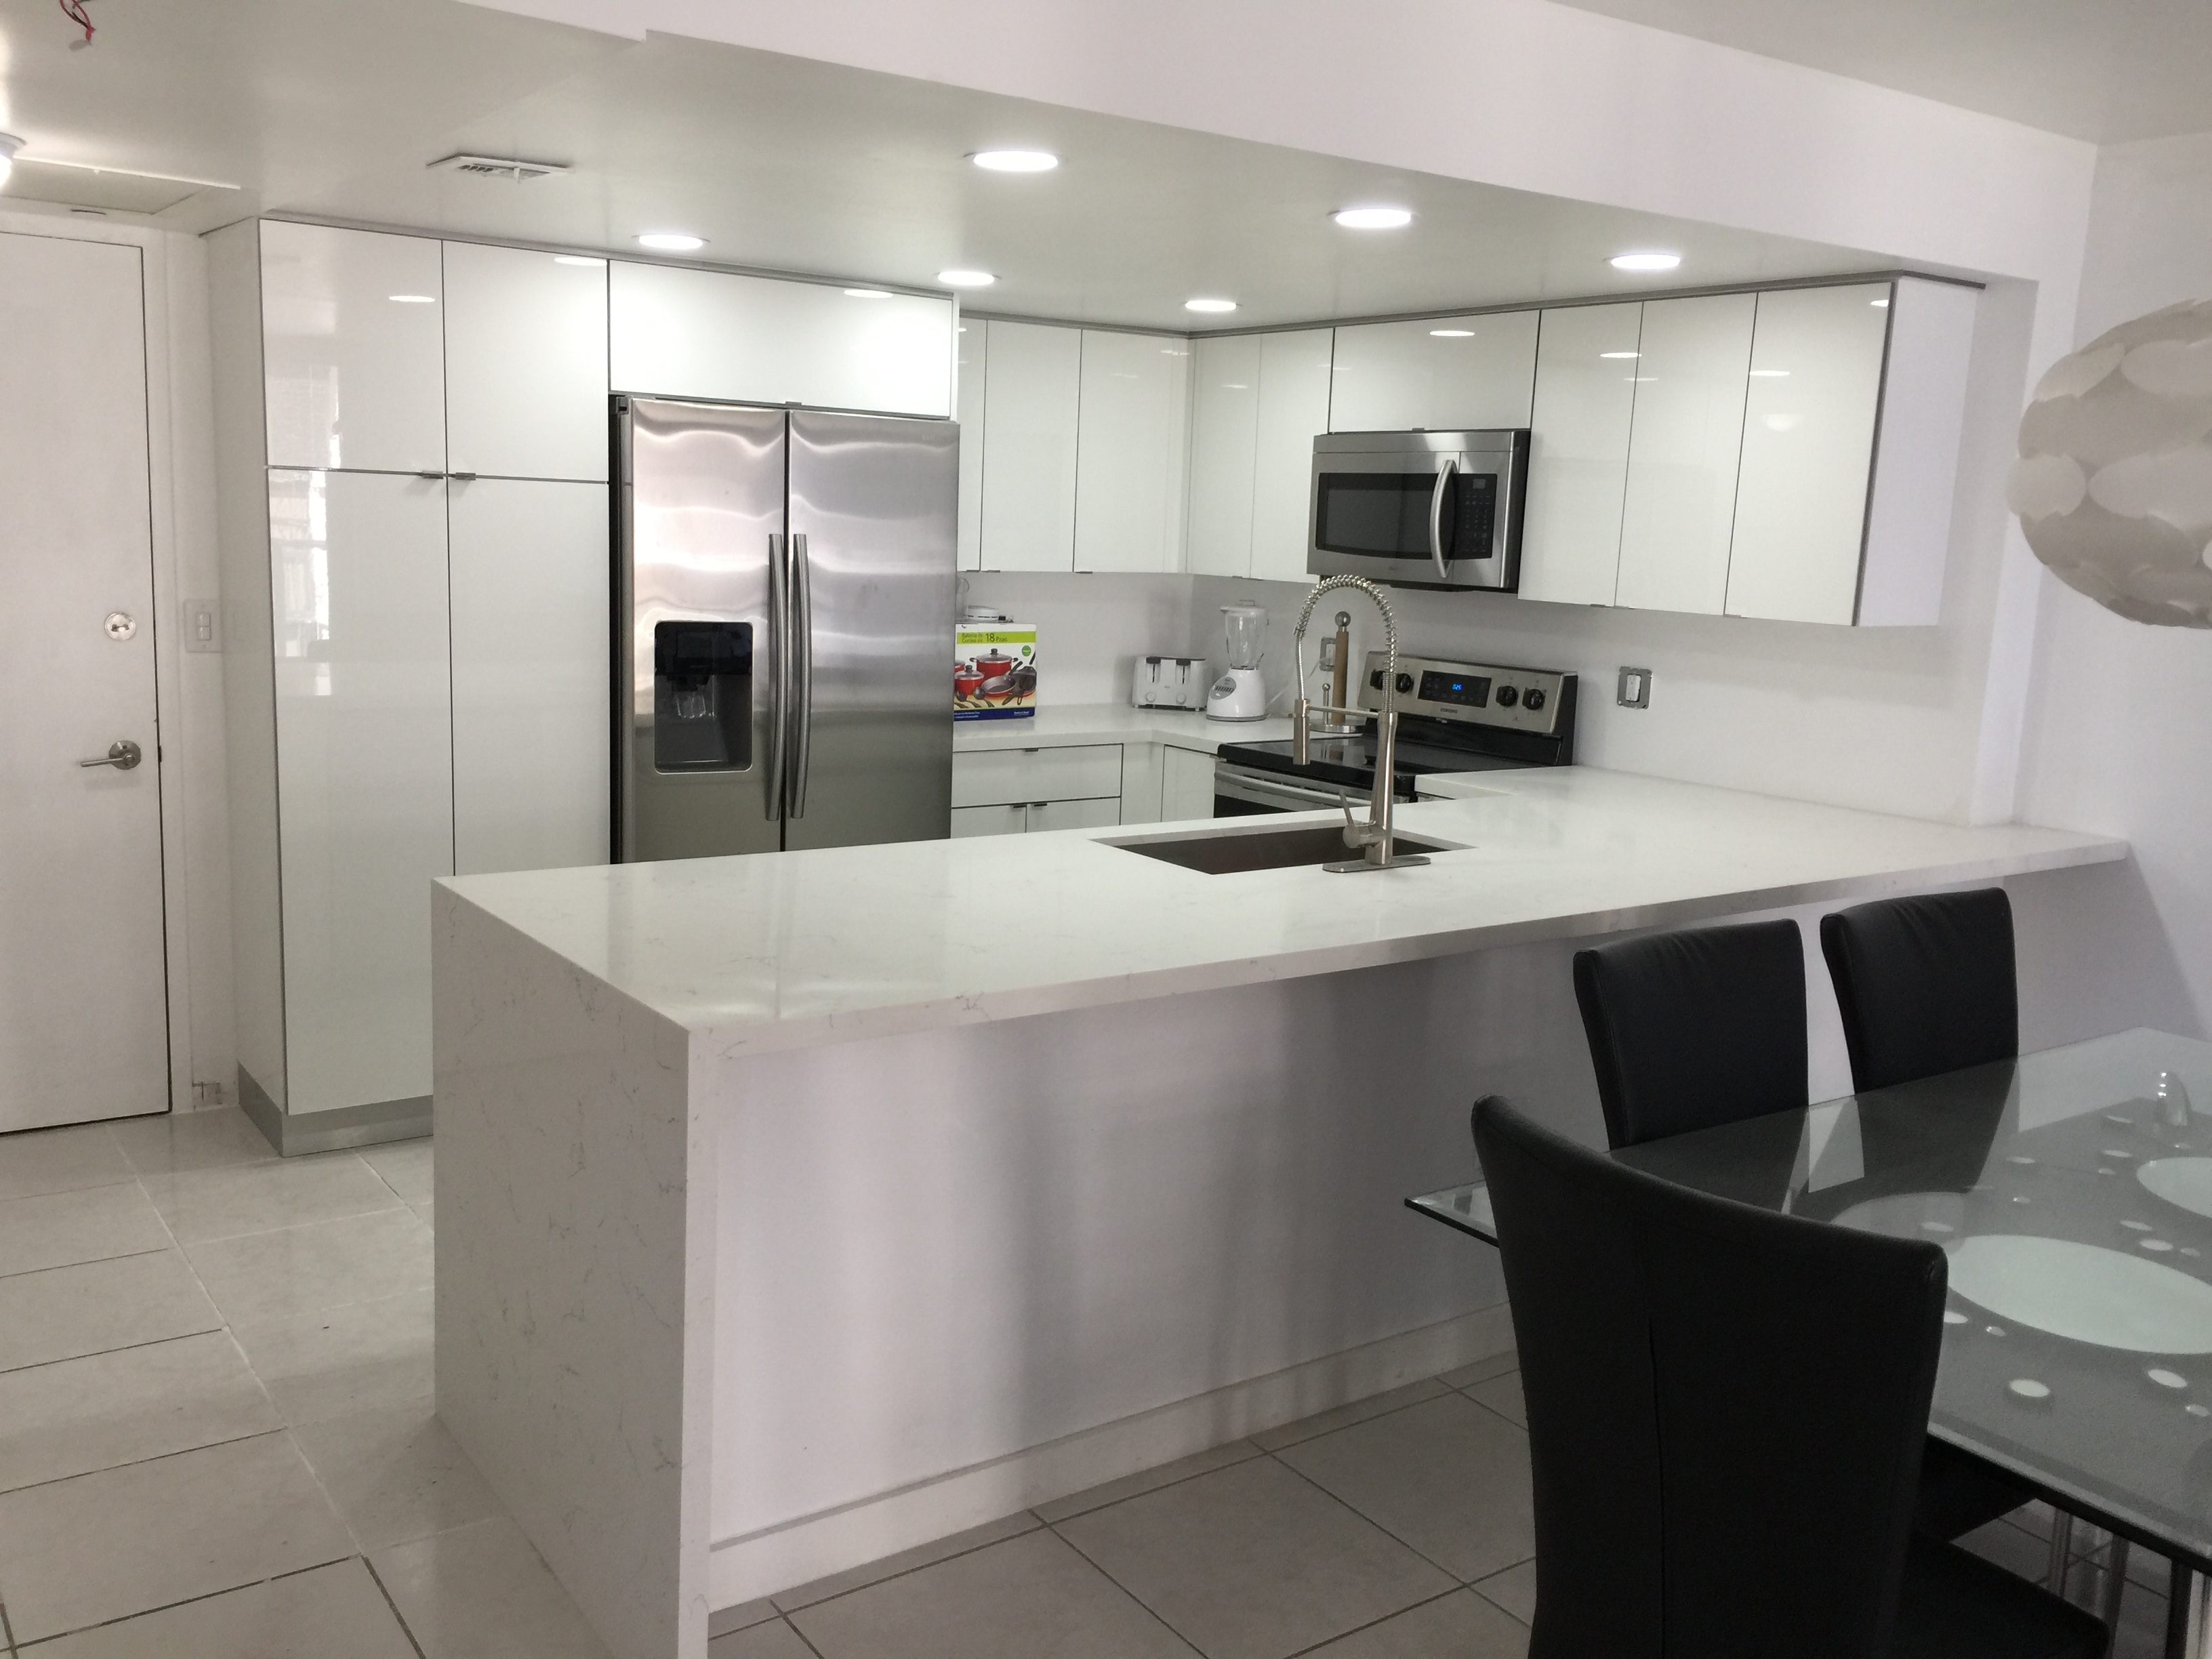 Modern White Kitchen Cabinet Installation - Universal Cabinets and Closets